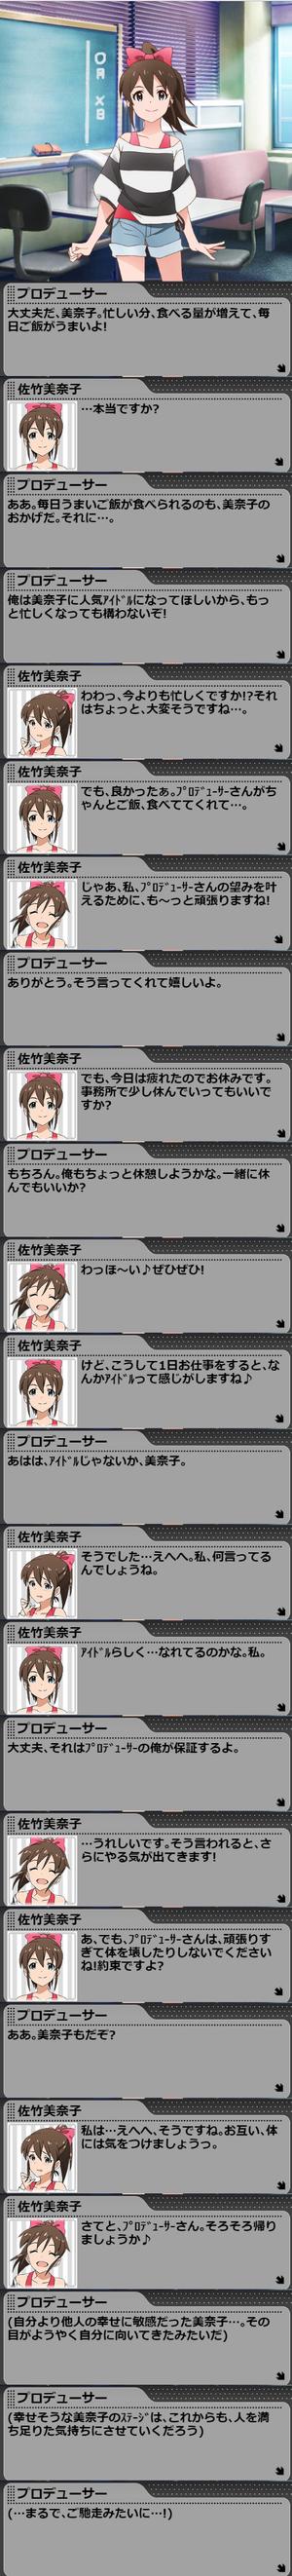 美奈子LV6_3